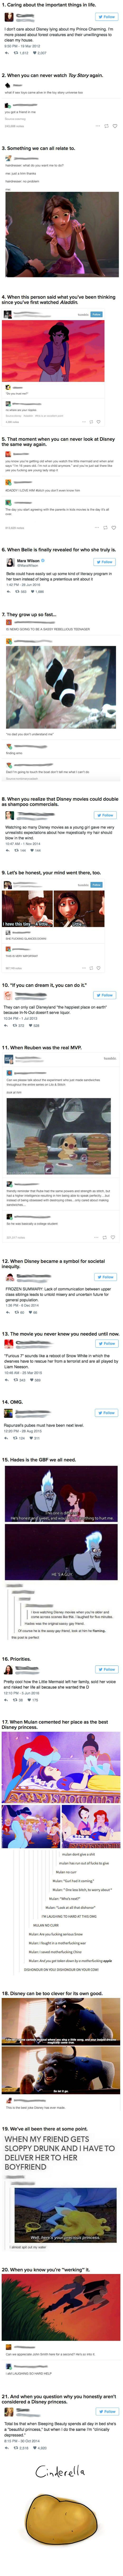 21 Funny Disney Posts That'll Make You Pee Your Pants - 9GAG